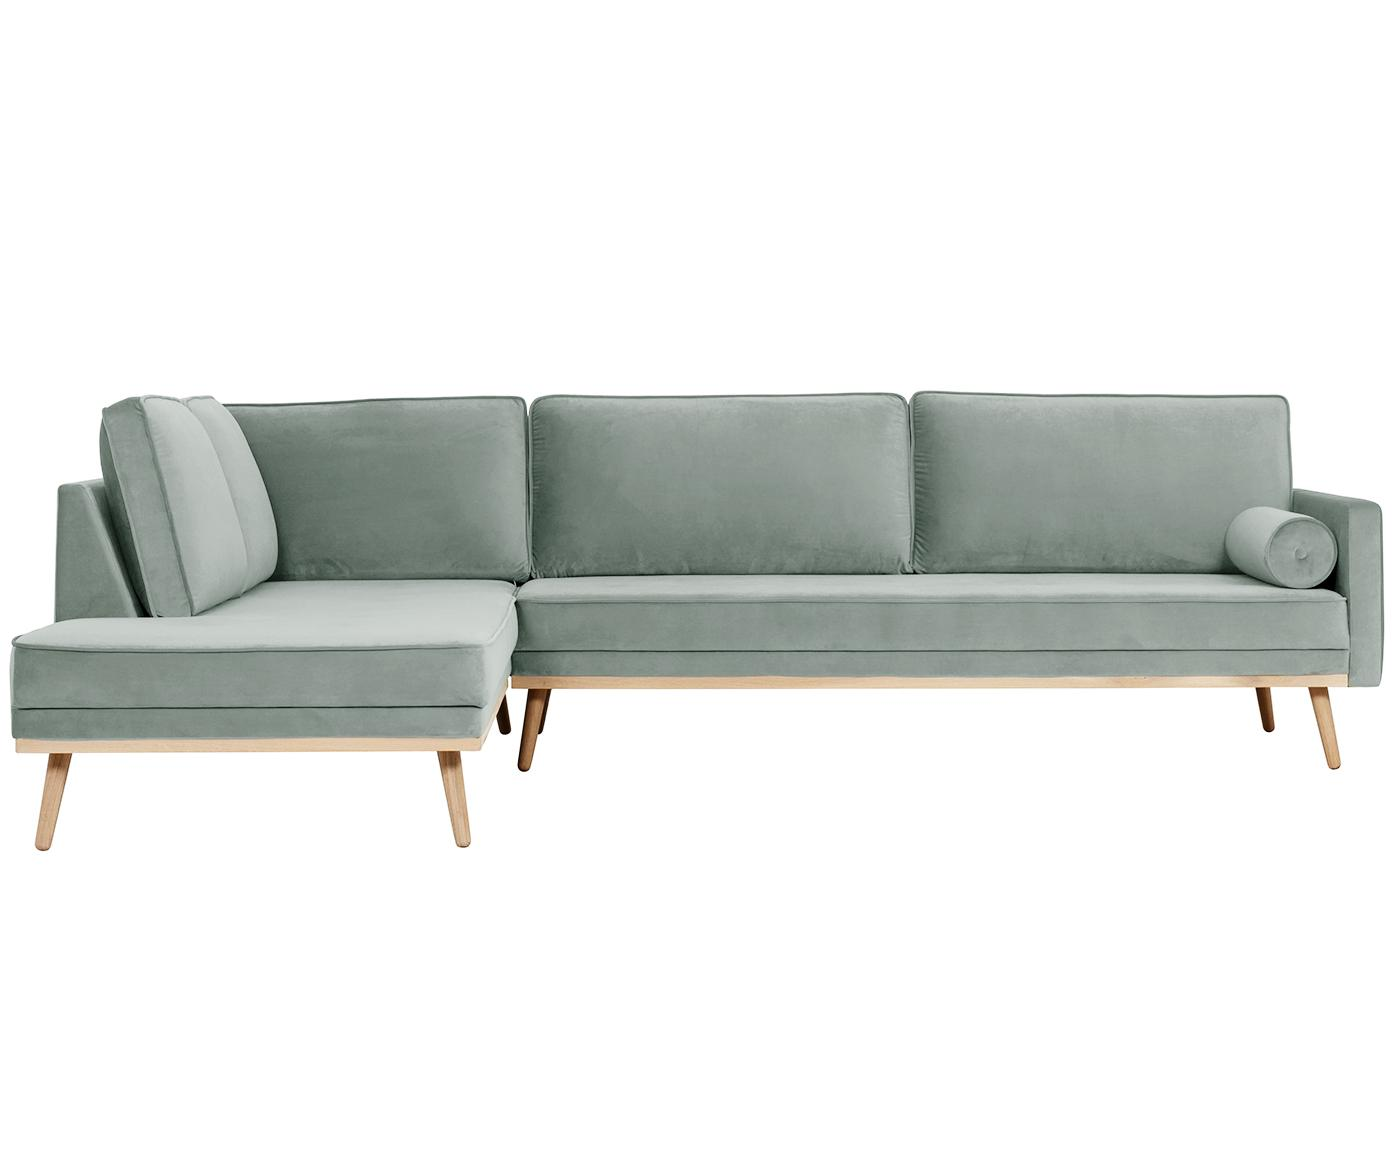 Samt-Ecksofa Saint (4-Sitzer), Bezug: Samt (Polyester) 35.000 S, Gestell: Massives Kiefernholz, Spa, Webstoff Salbeifarben, B 294 x T 220 cm